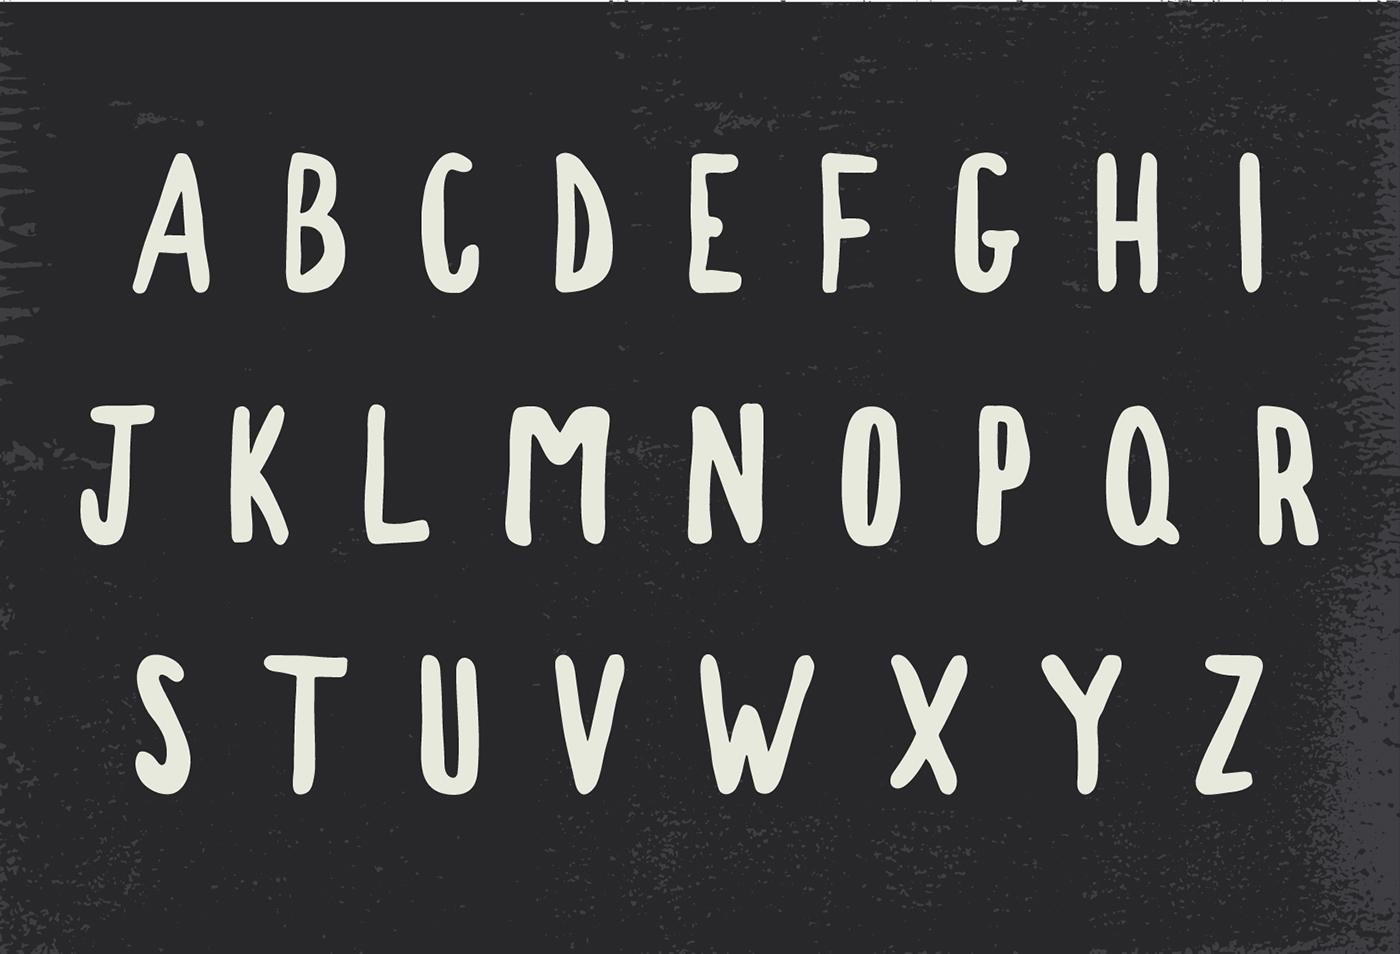 Free font free fonts freebies Brush font hand drawn sans serif Hand Painted freebie free typeface